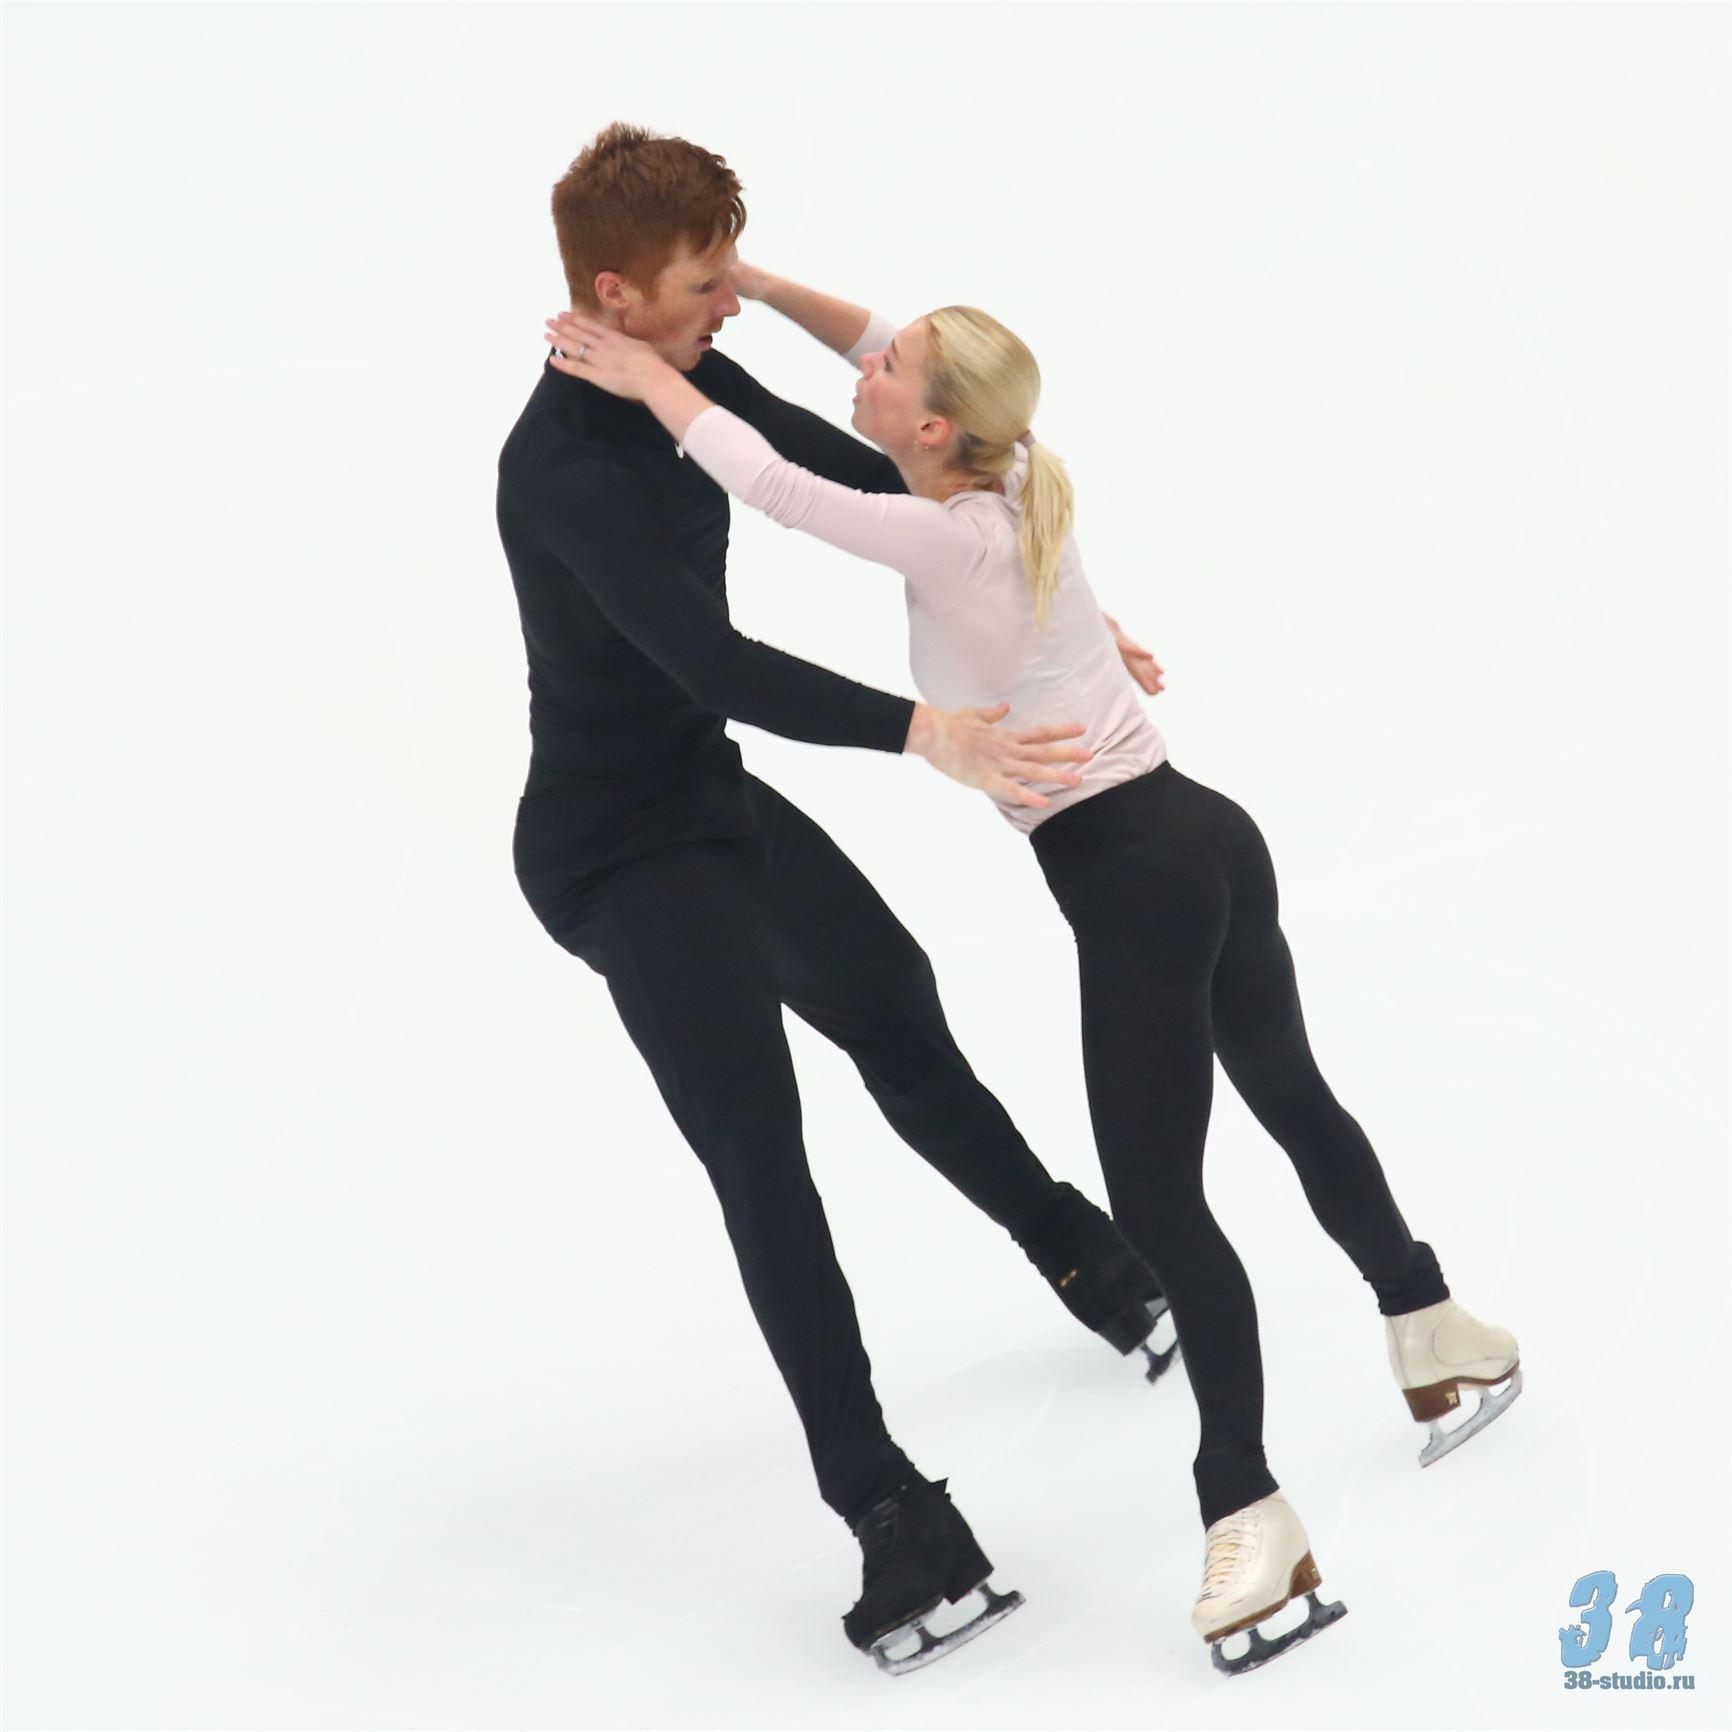 Евгения Тарасова - Владимир Морозов-2 - Страница 14 OMF2cY5xyj4